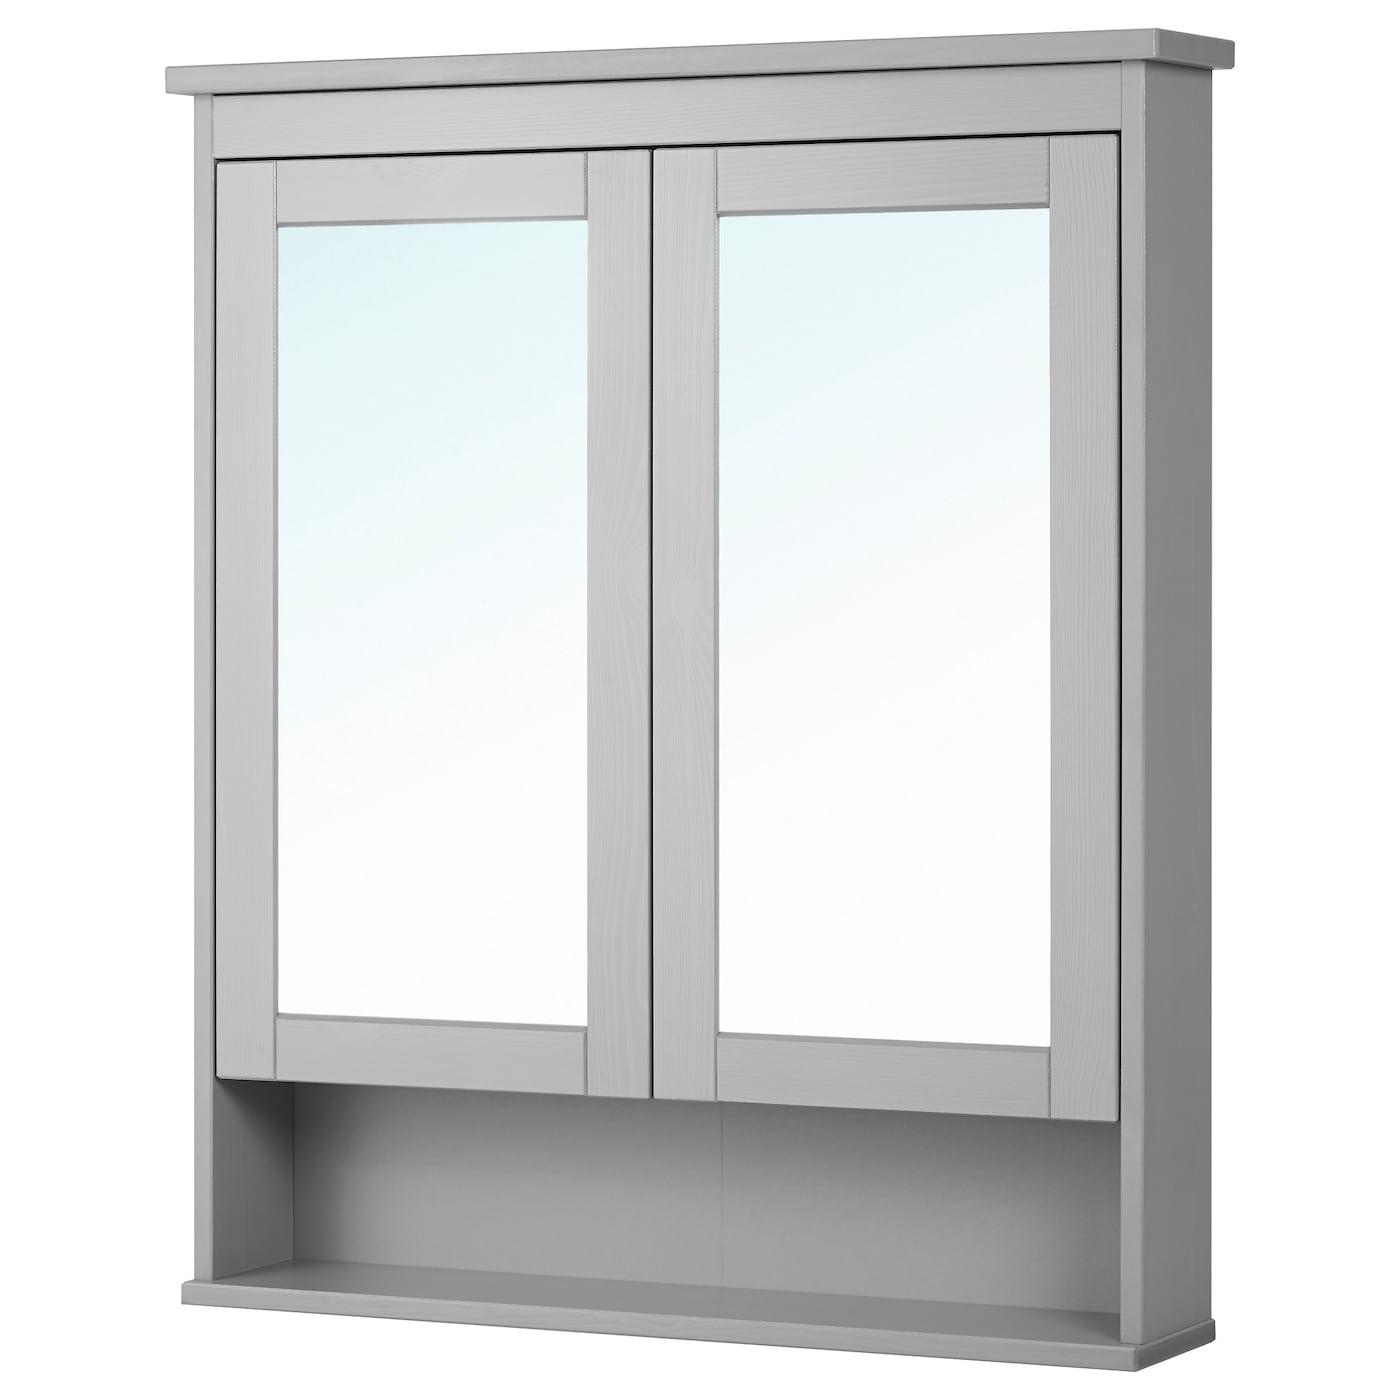 hemnes mirror cabinet with 2 doors grey 83 x 16 x 98 cm ikea. Black Bedroom Furniture Sets. Home Design Ideas